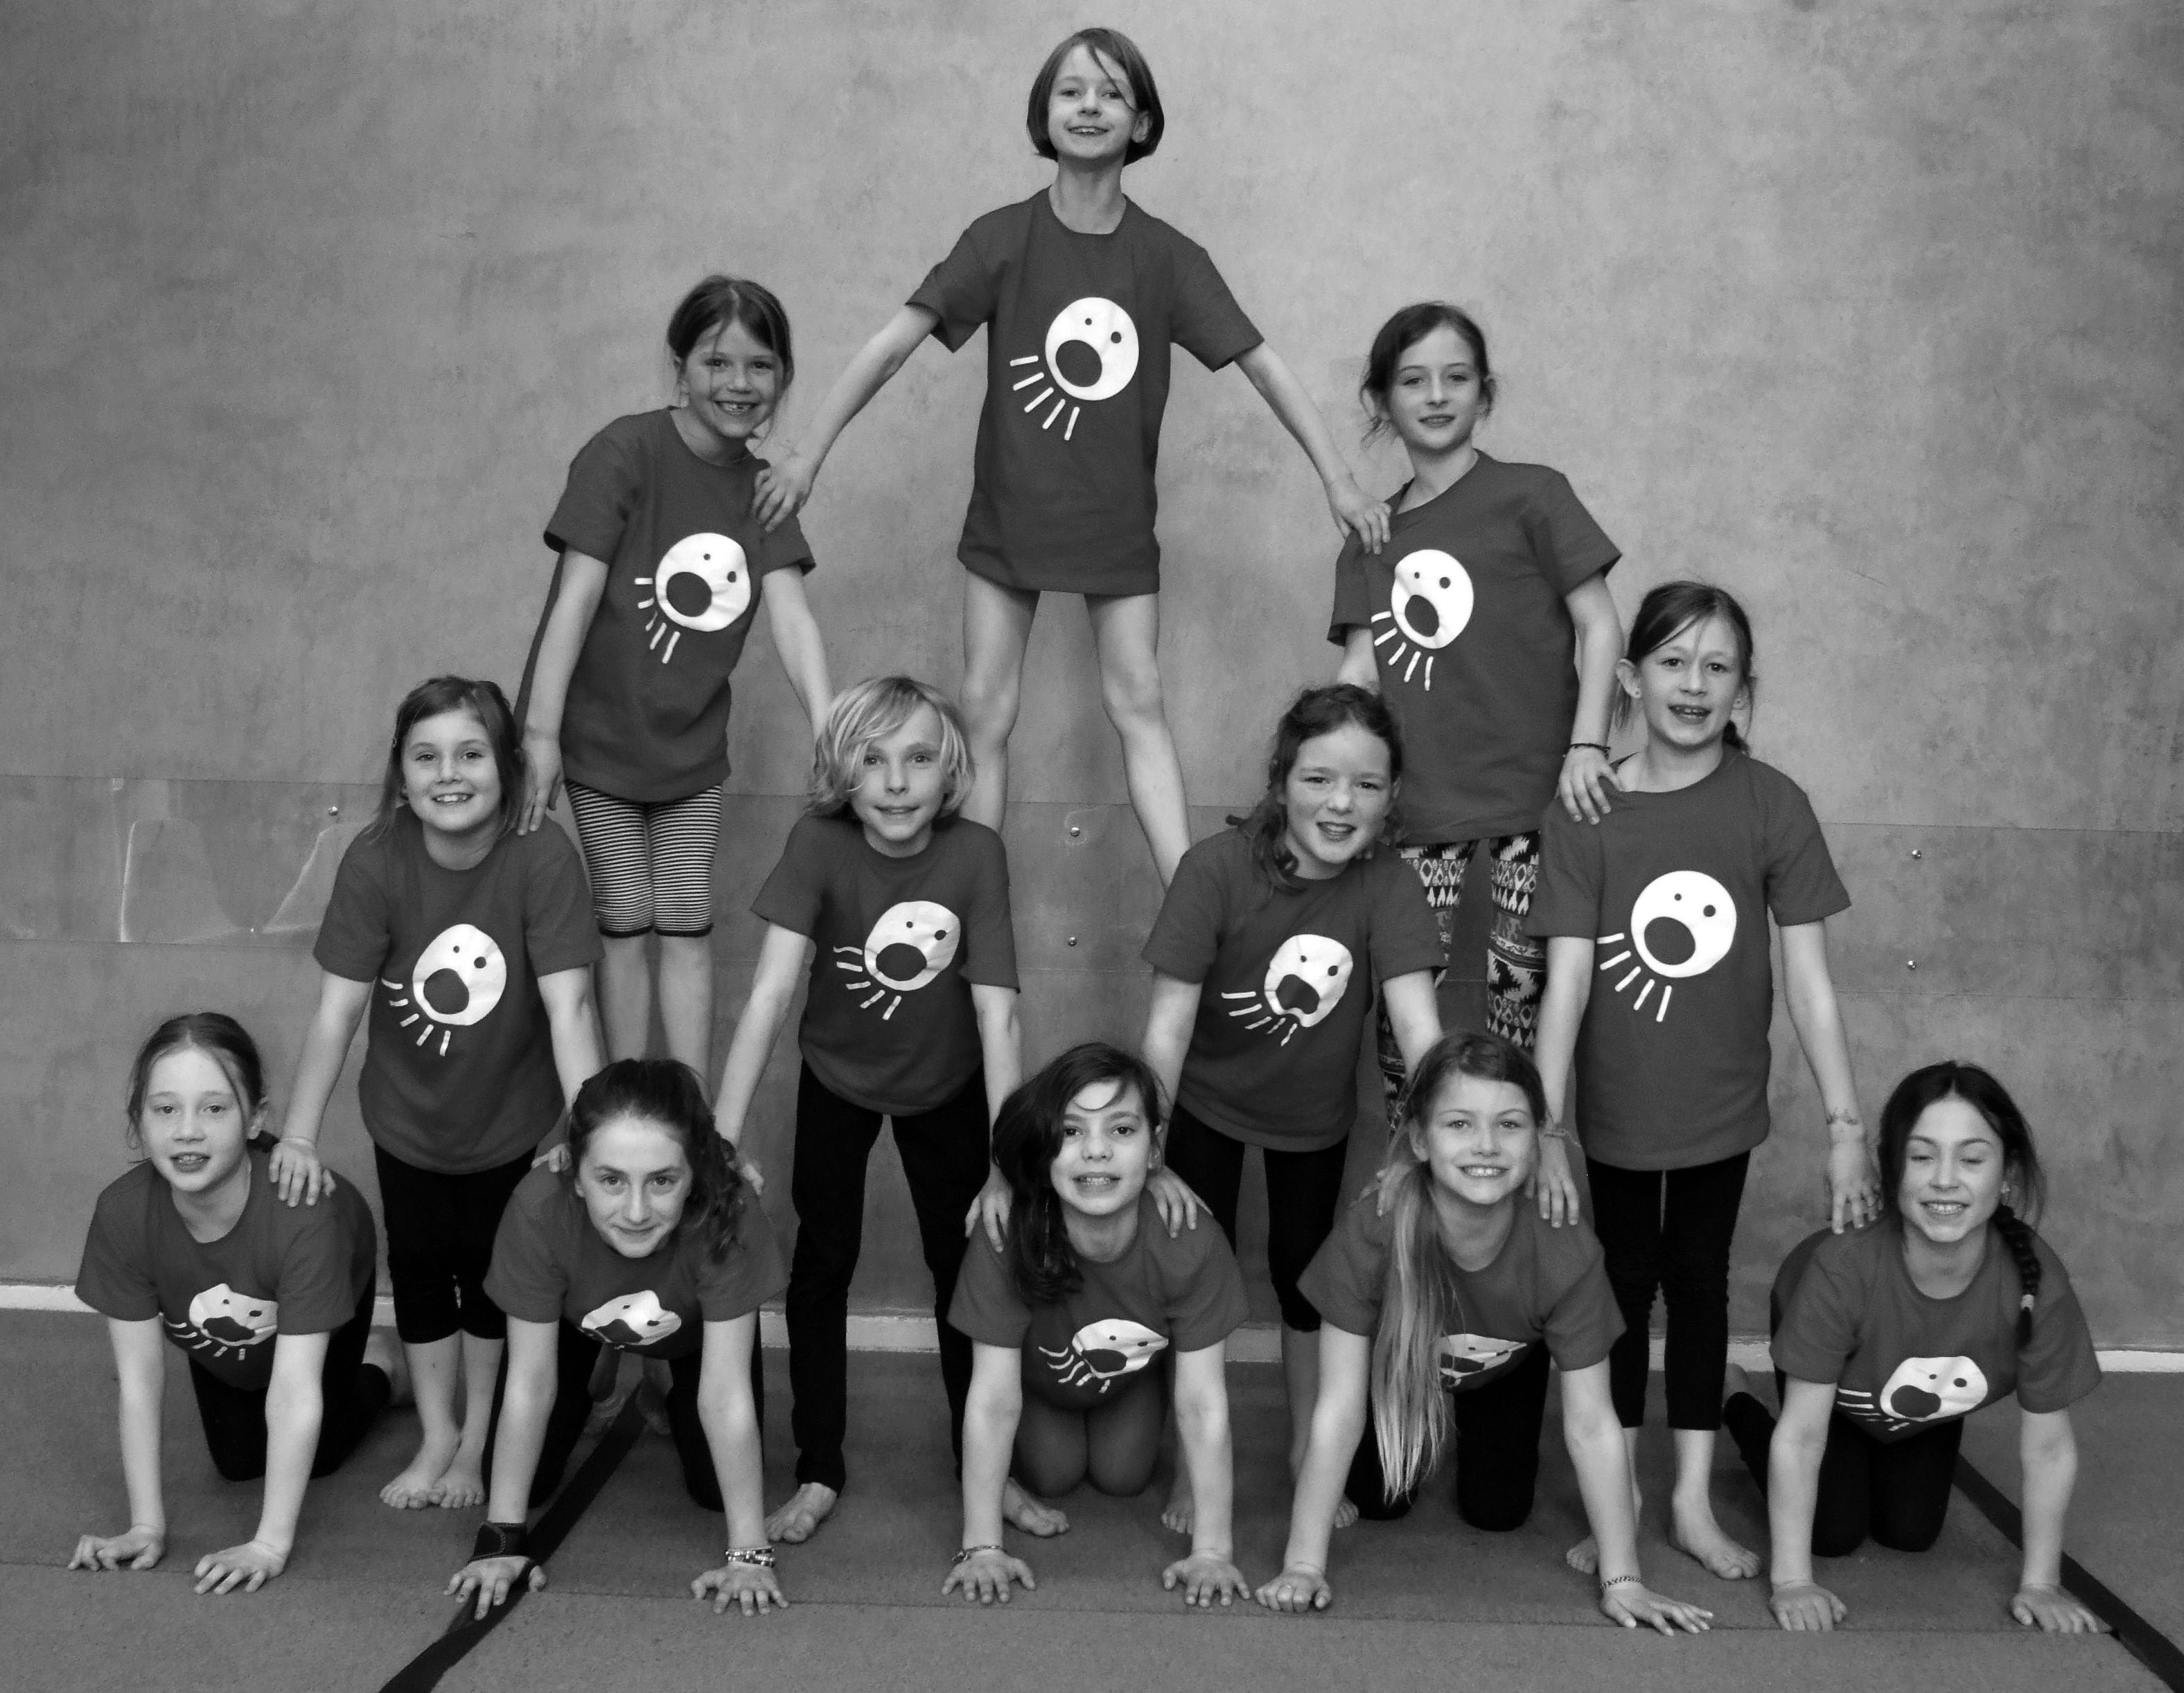 Kinderakrobatik Maerz swweb2014 047